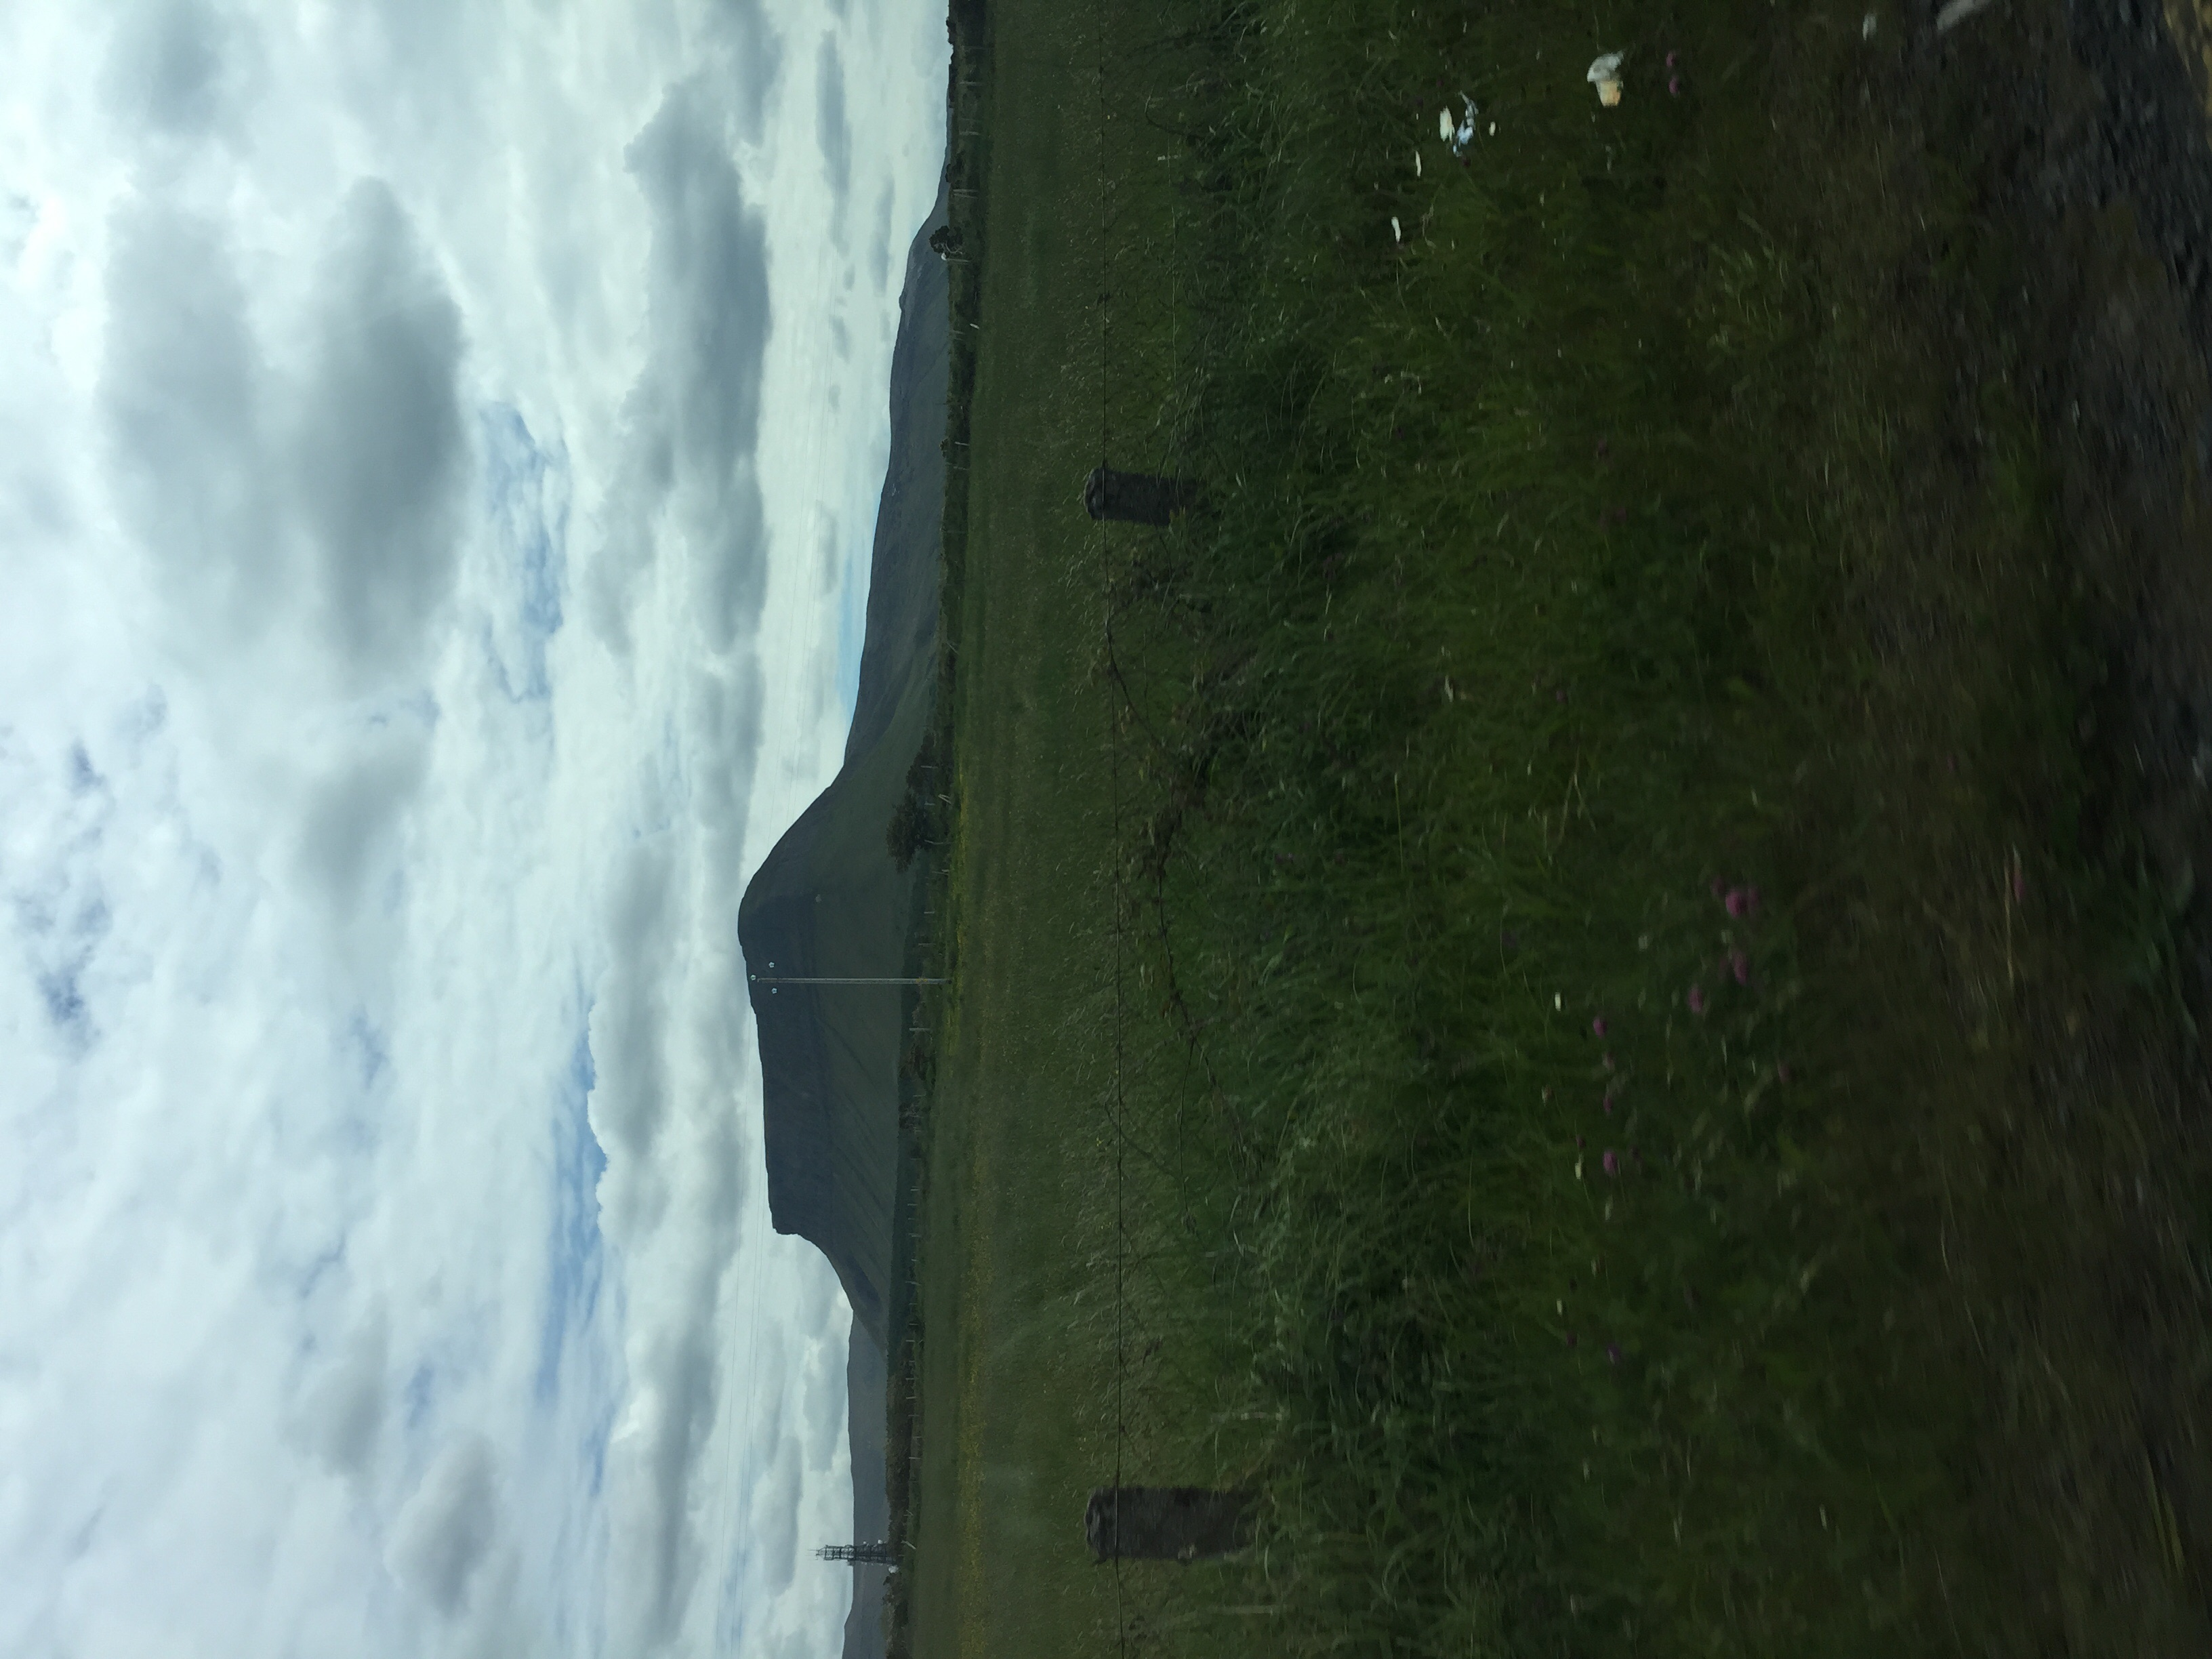 Ben Bulben and the Darty Mountains